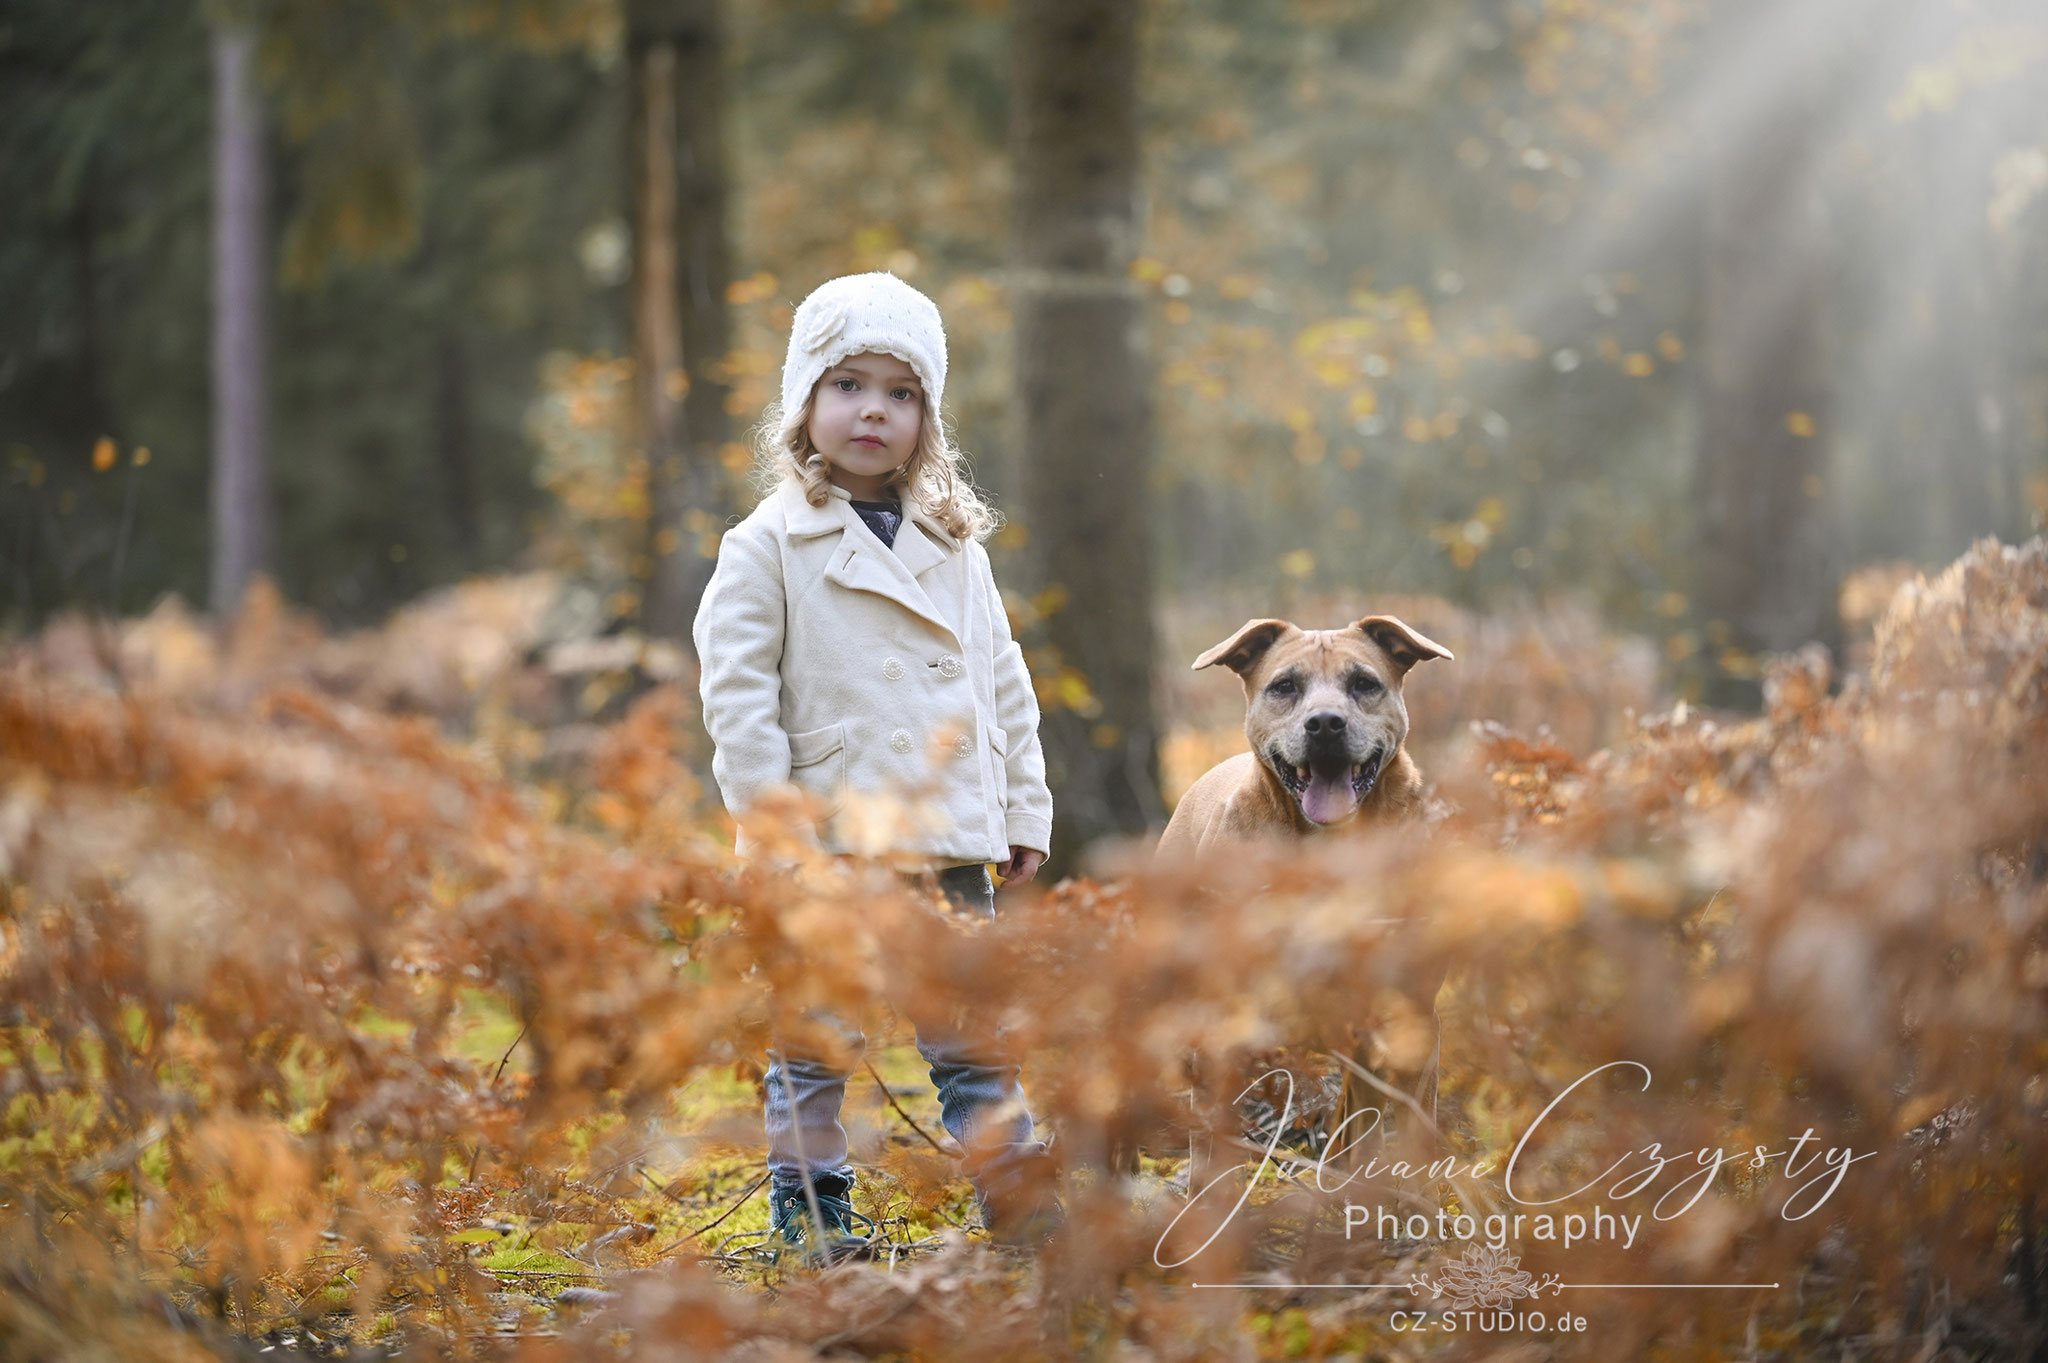 Moderne Kinderfotografie - Juliane Czysty Fotografin Landkreis ROW